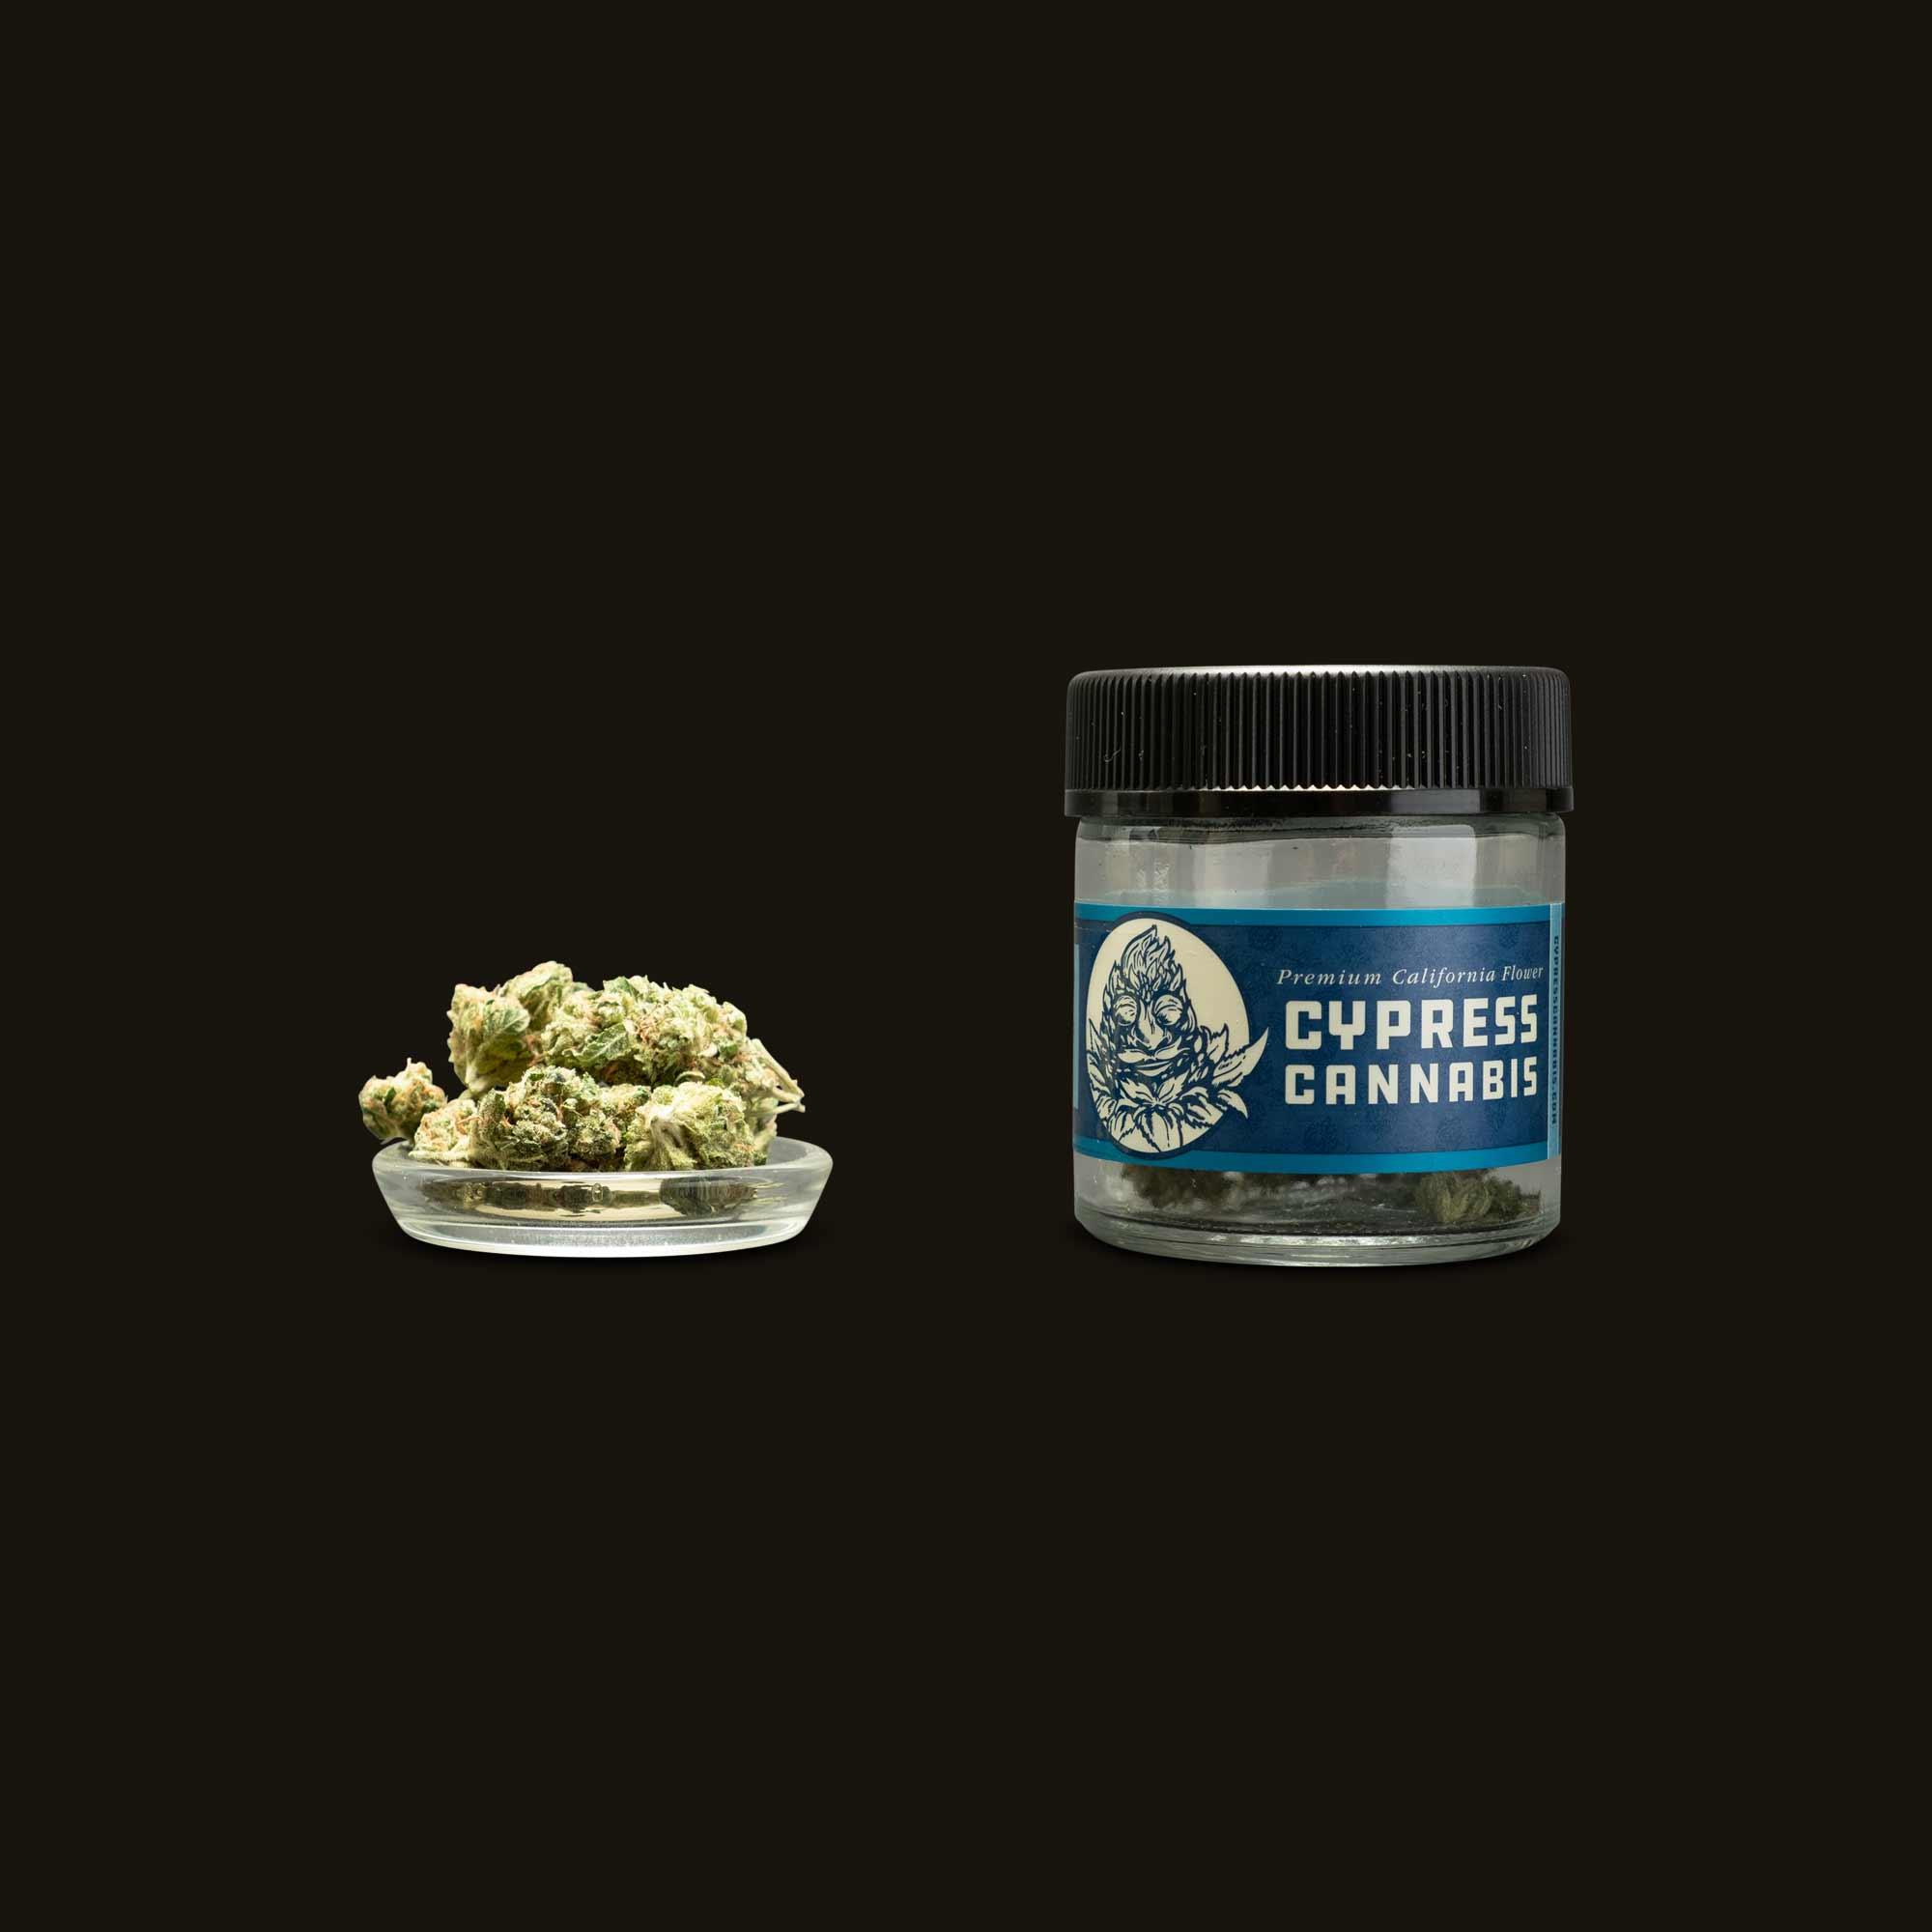 Cypress Cannabis East Coast Sour Diesel